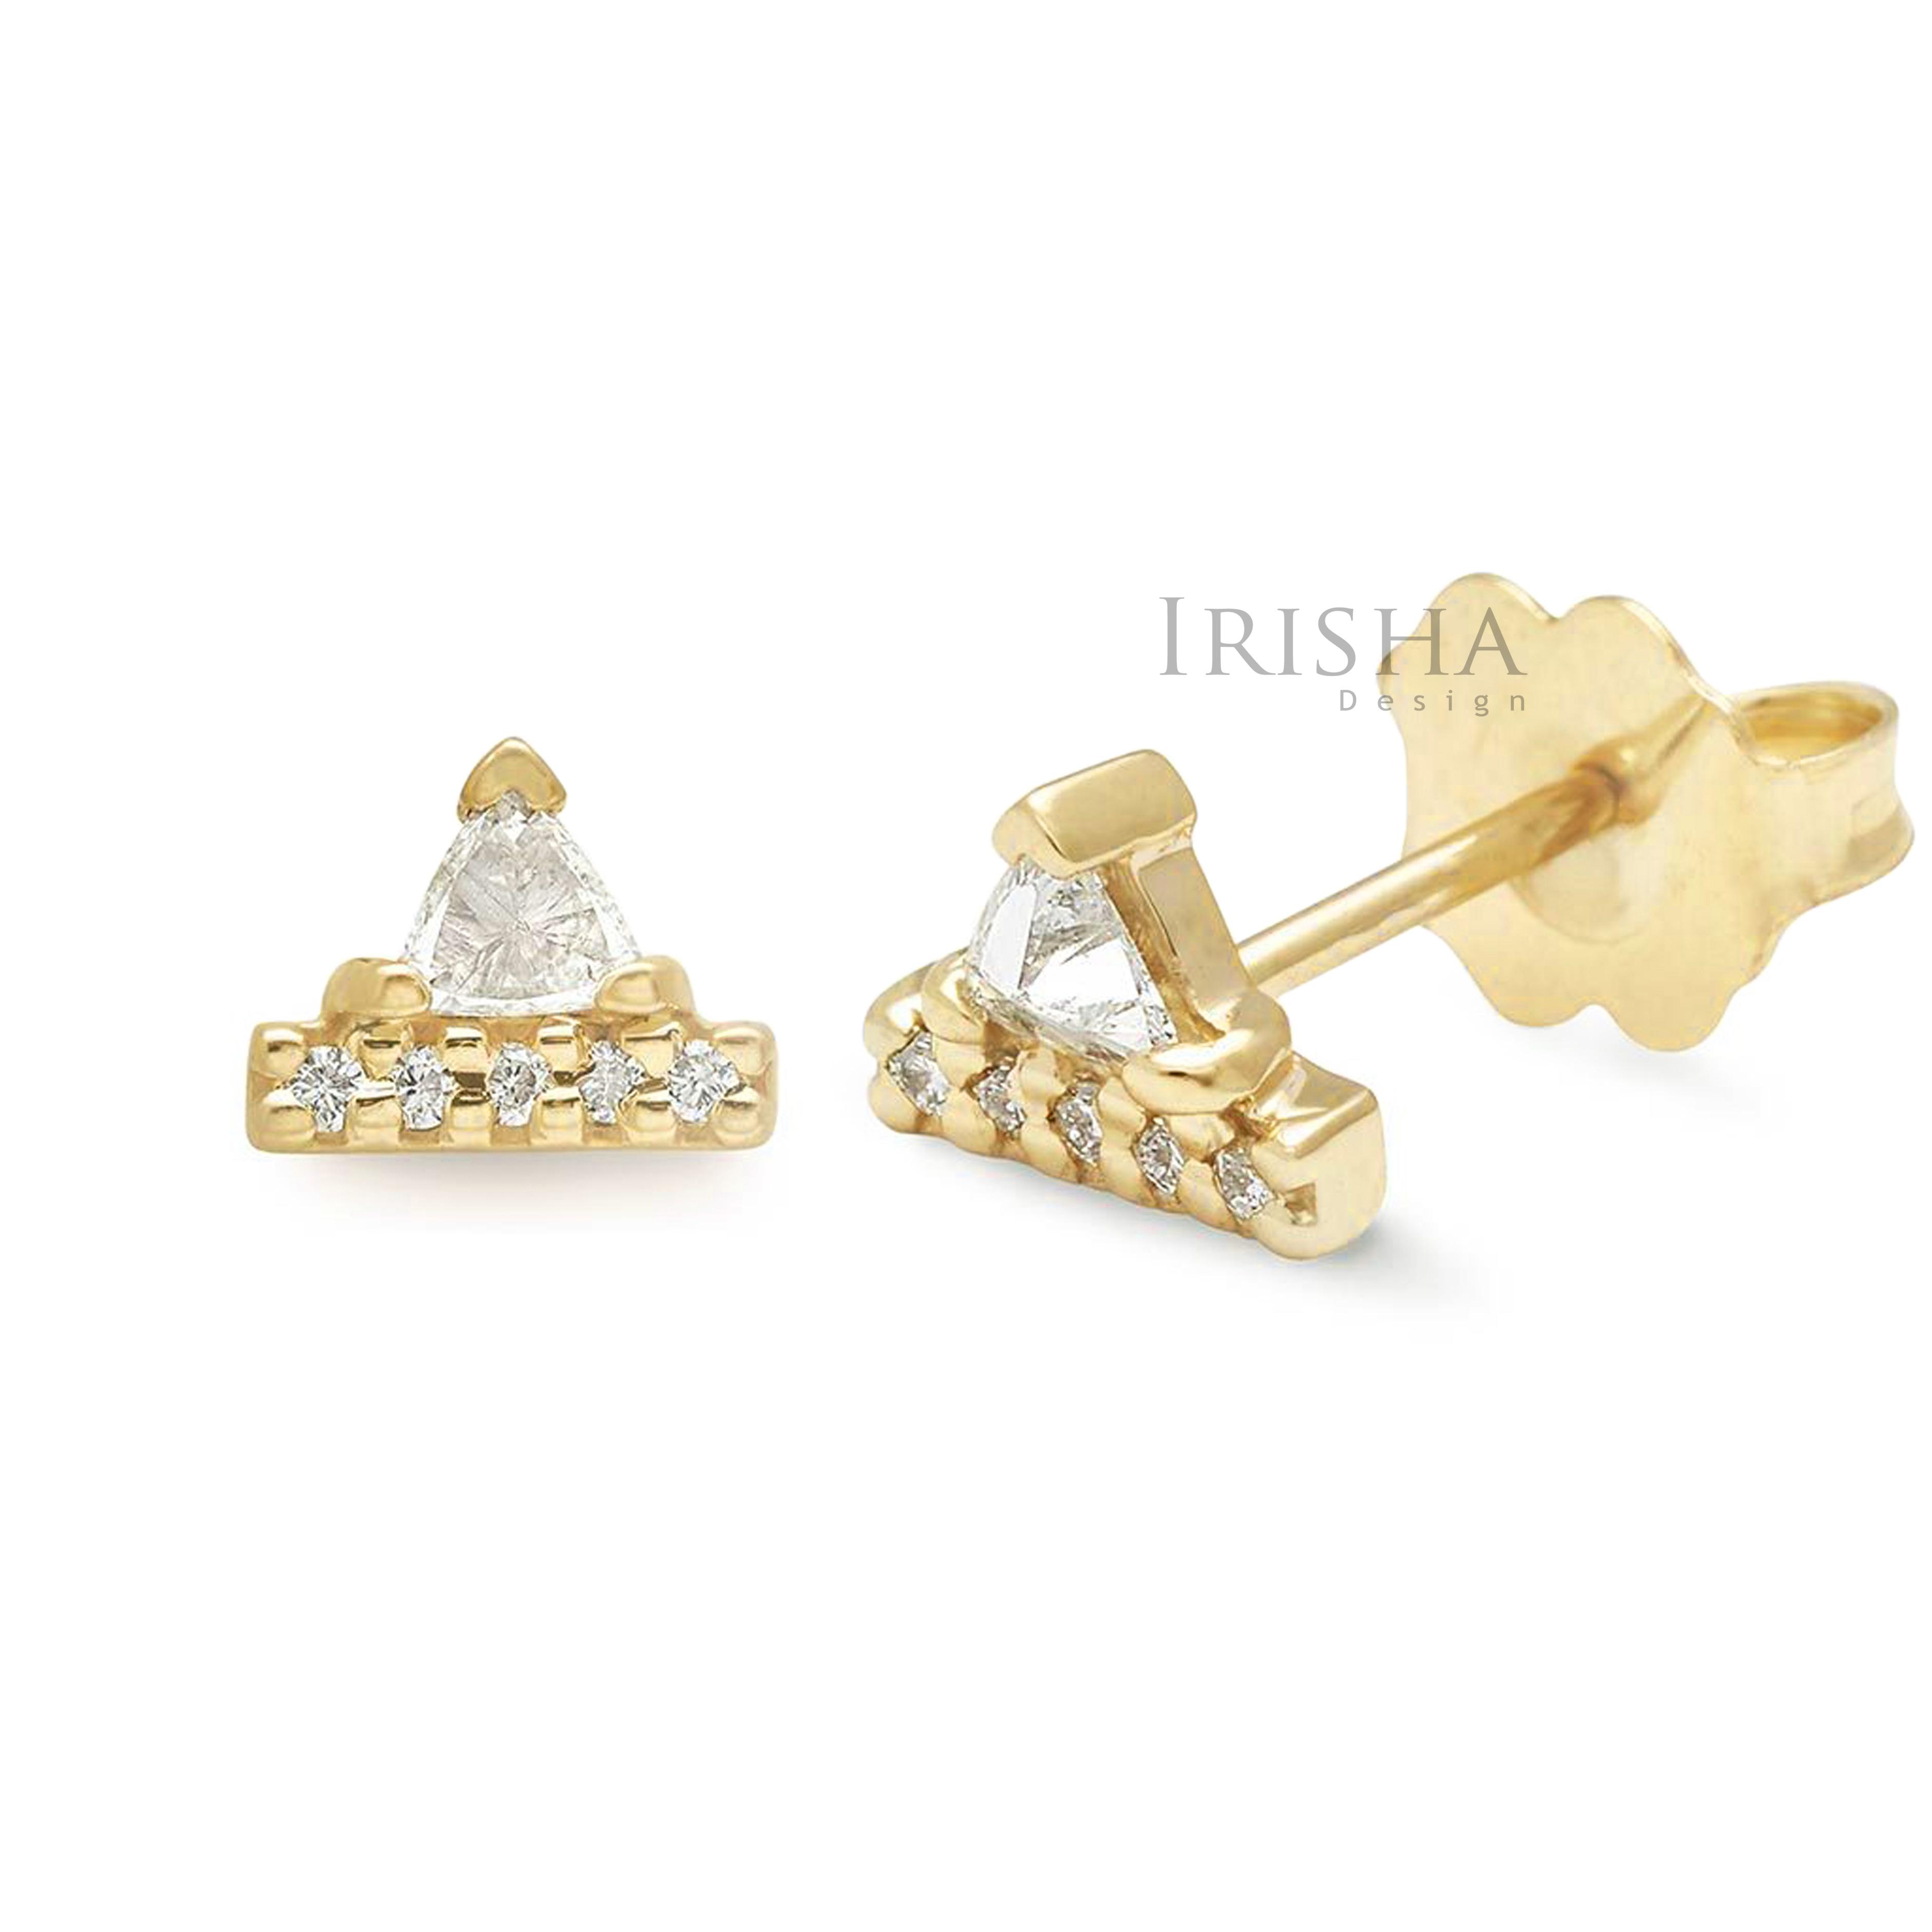 14K Gold 0.20 Ct. Genuine Round & Trillion Diamond Bar Stud Earring Fine Jewelry